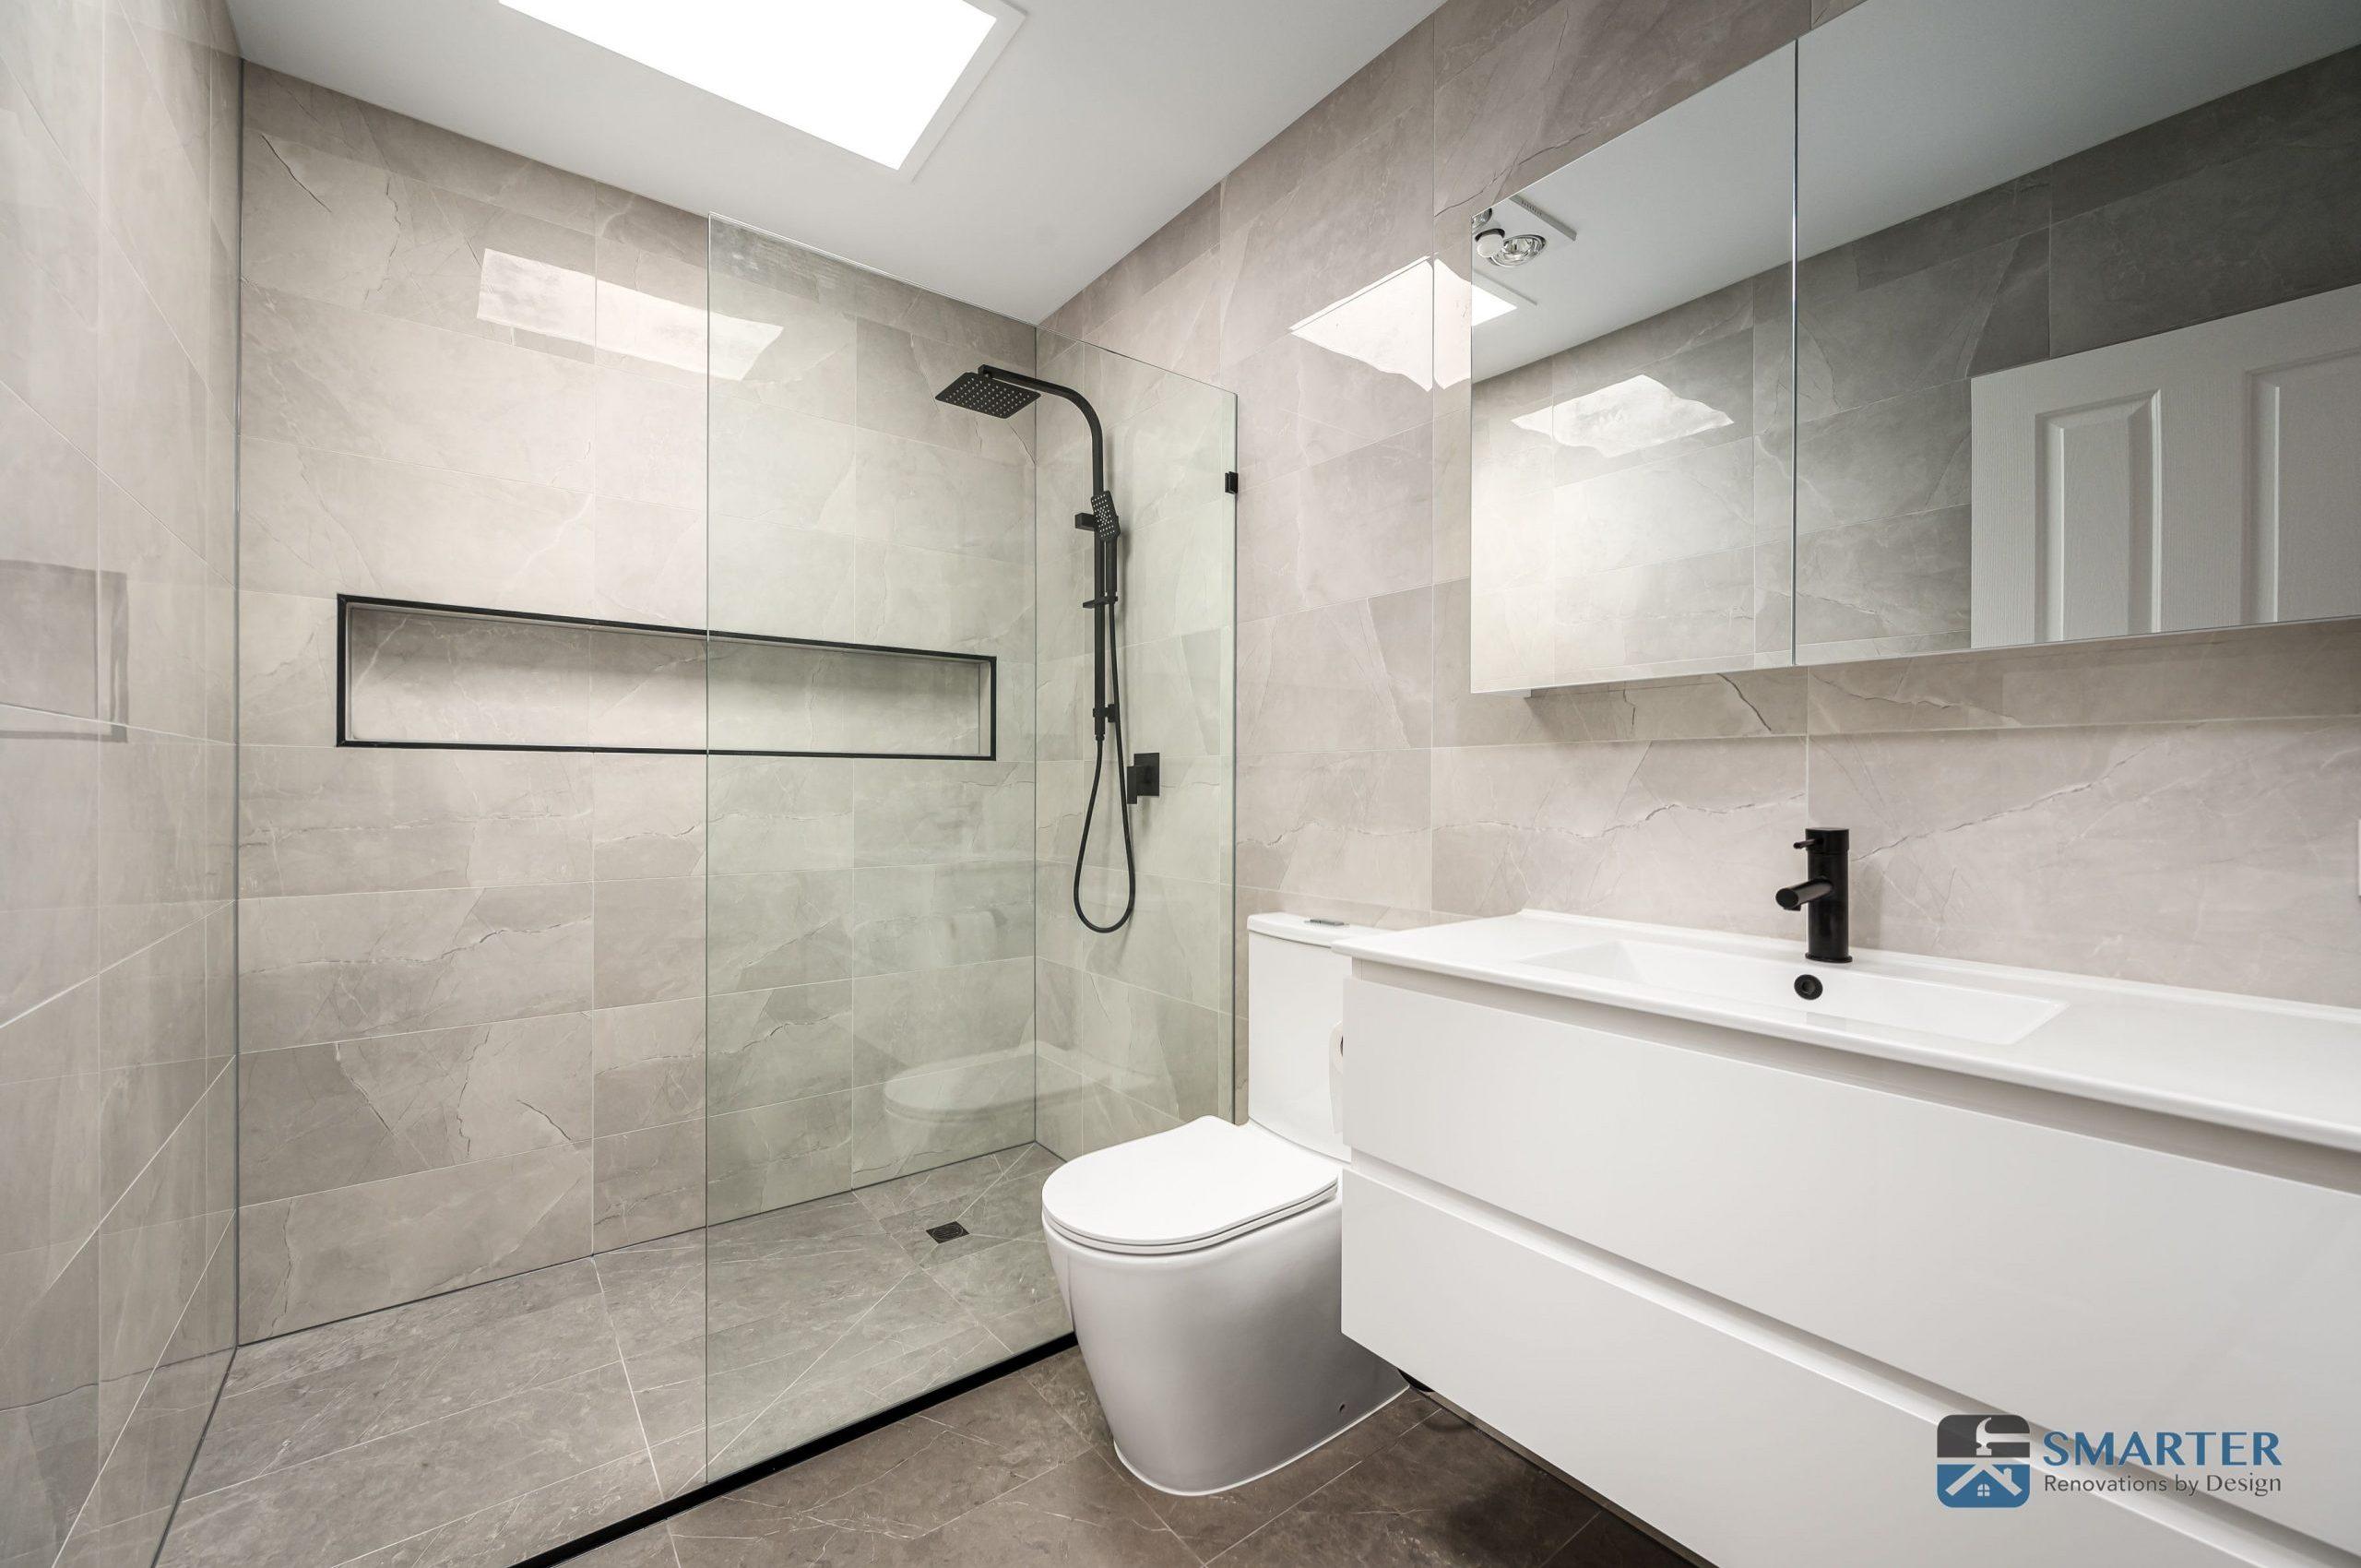 Kitchen and Bathroom Renovations Melbourne